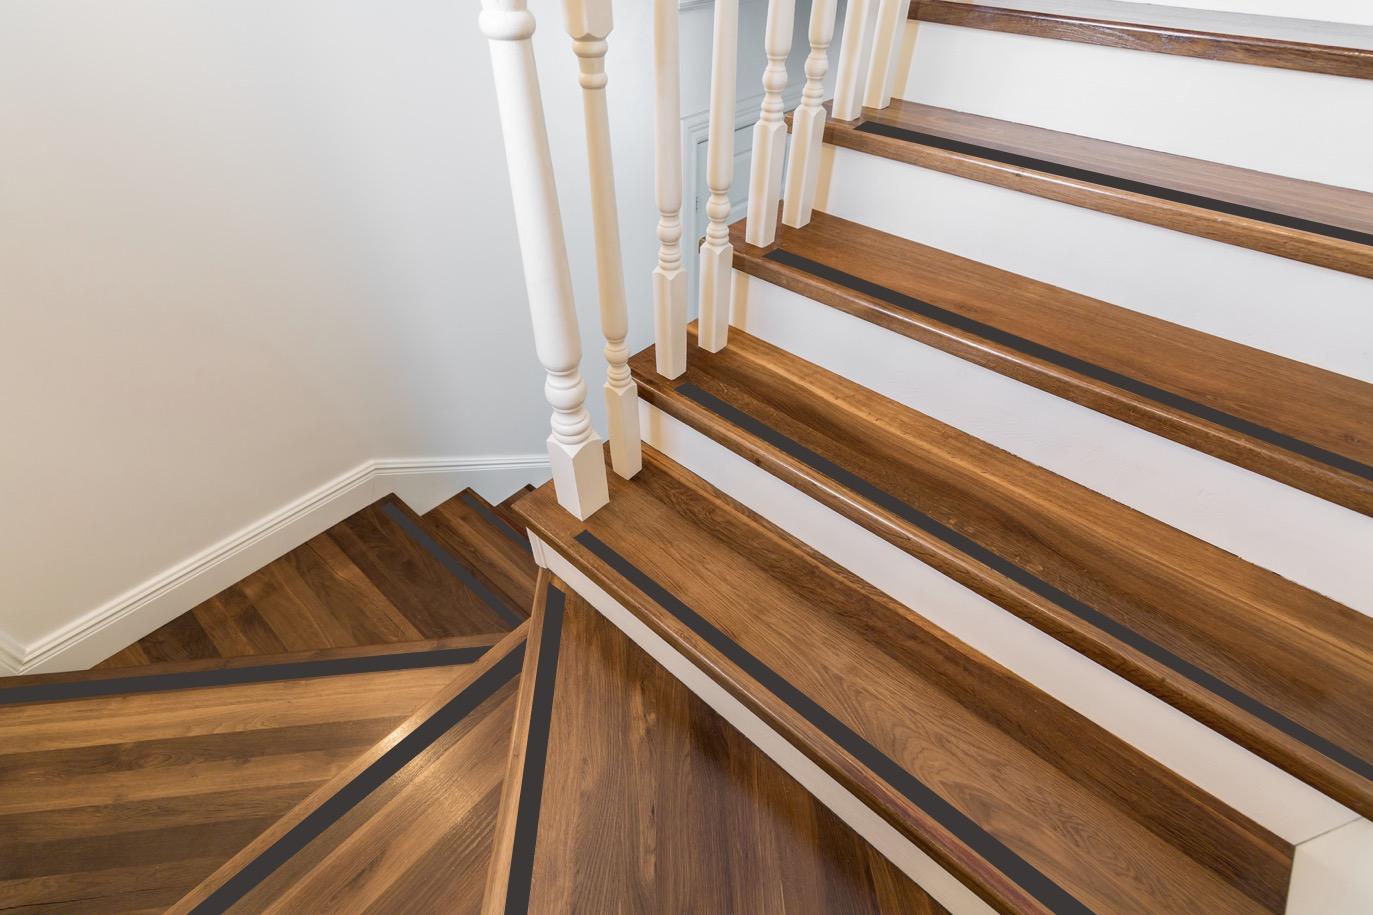 Escaliers éviter chutes bandes antidérapantes